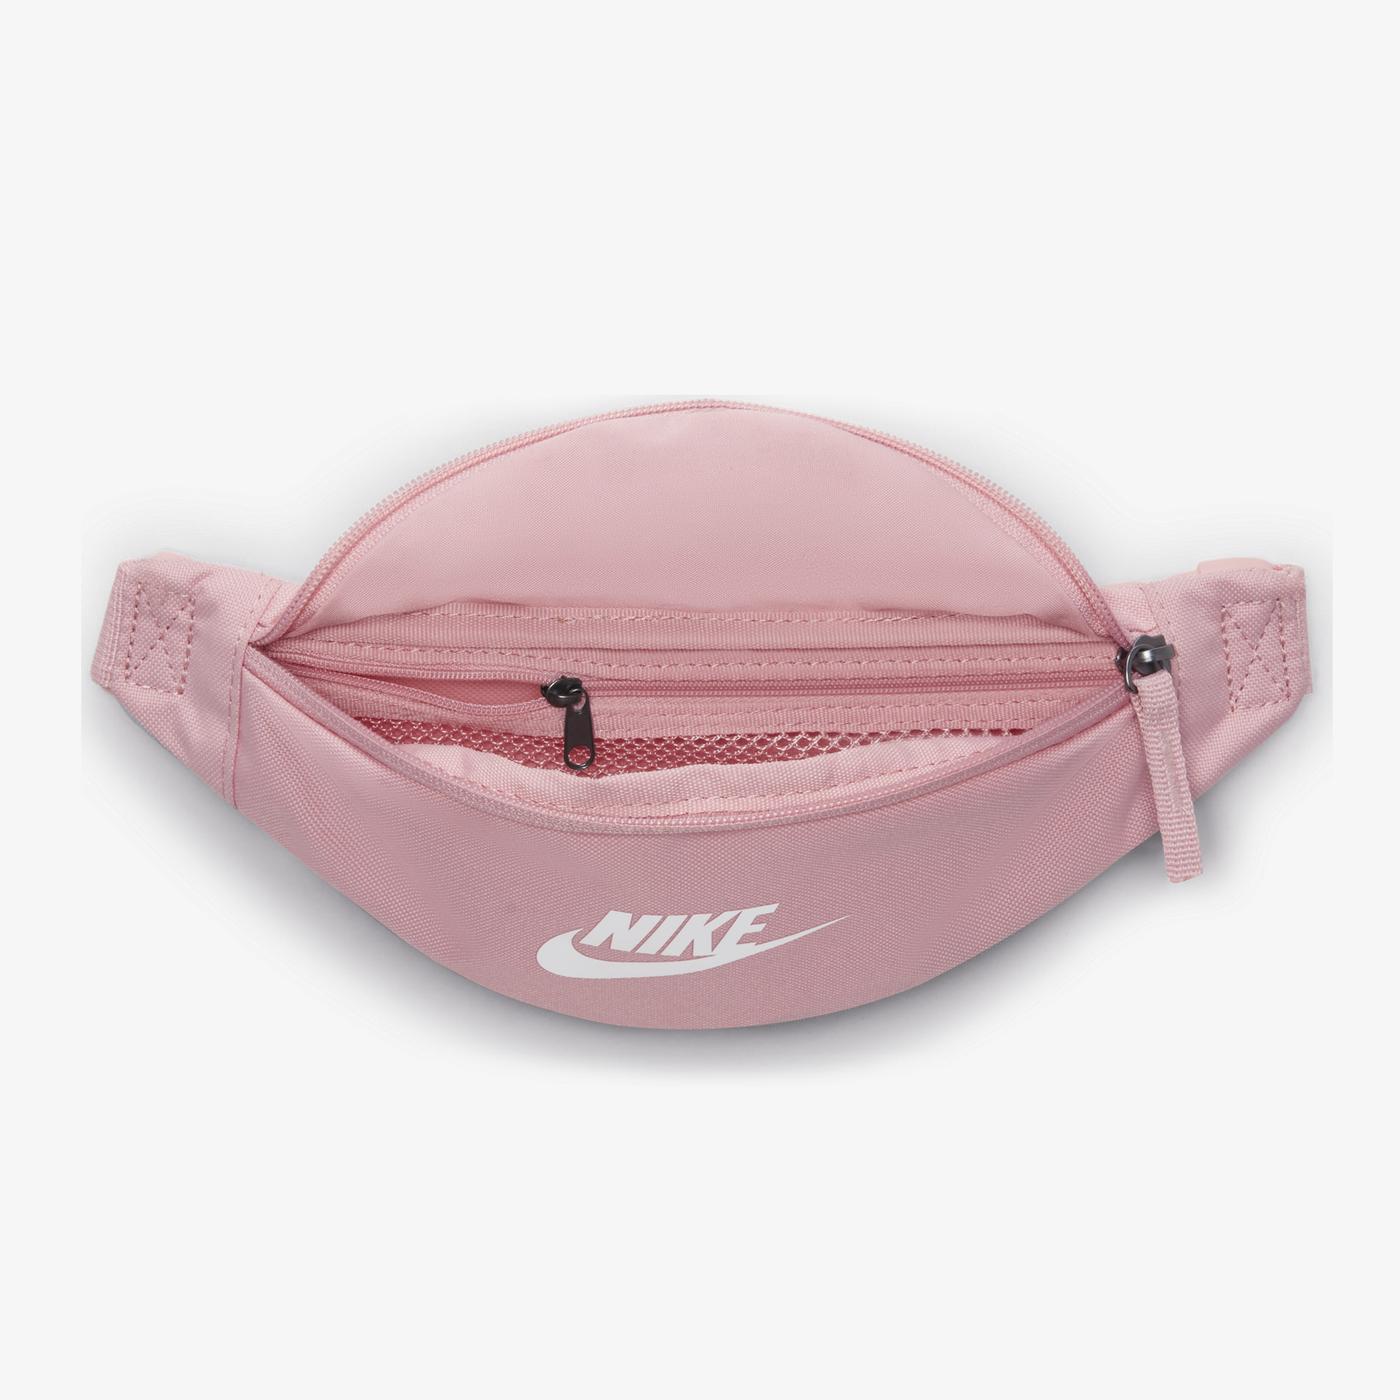 Nike Heritage Unisex Pembe Bel Çantası